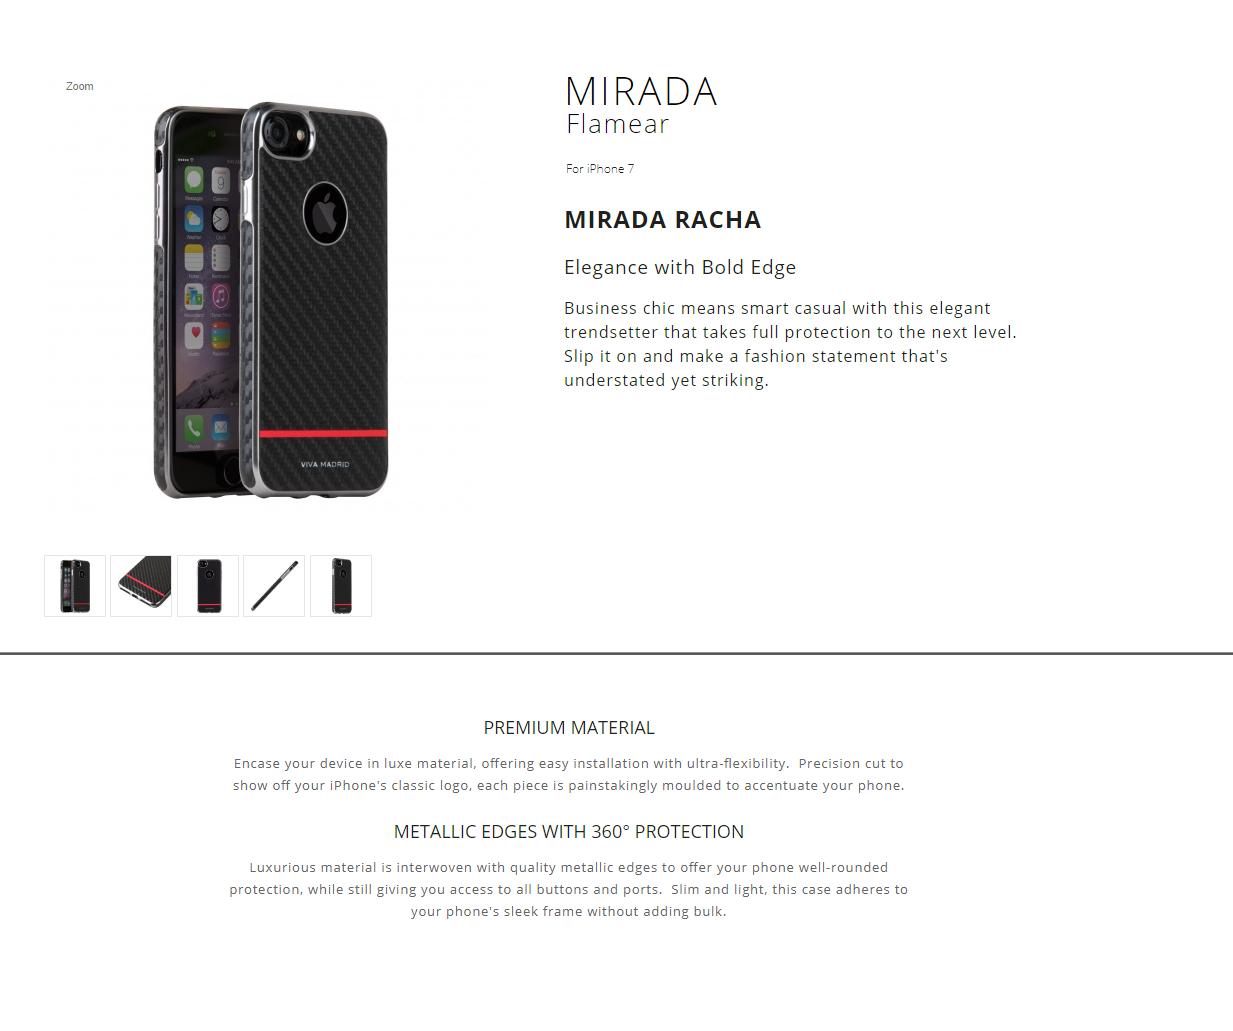 730d1a536e7 Viva iPhone 7 8 Back Case Mirada Racha Flamear Red 8886461223910